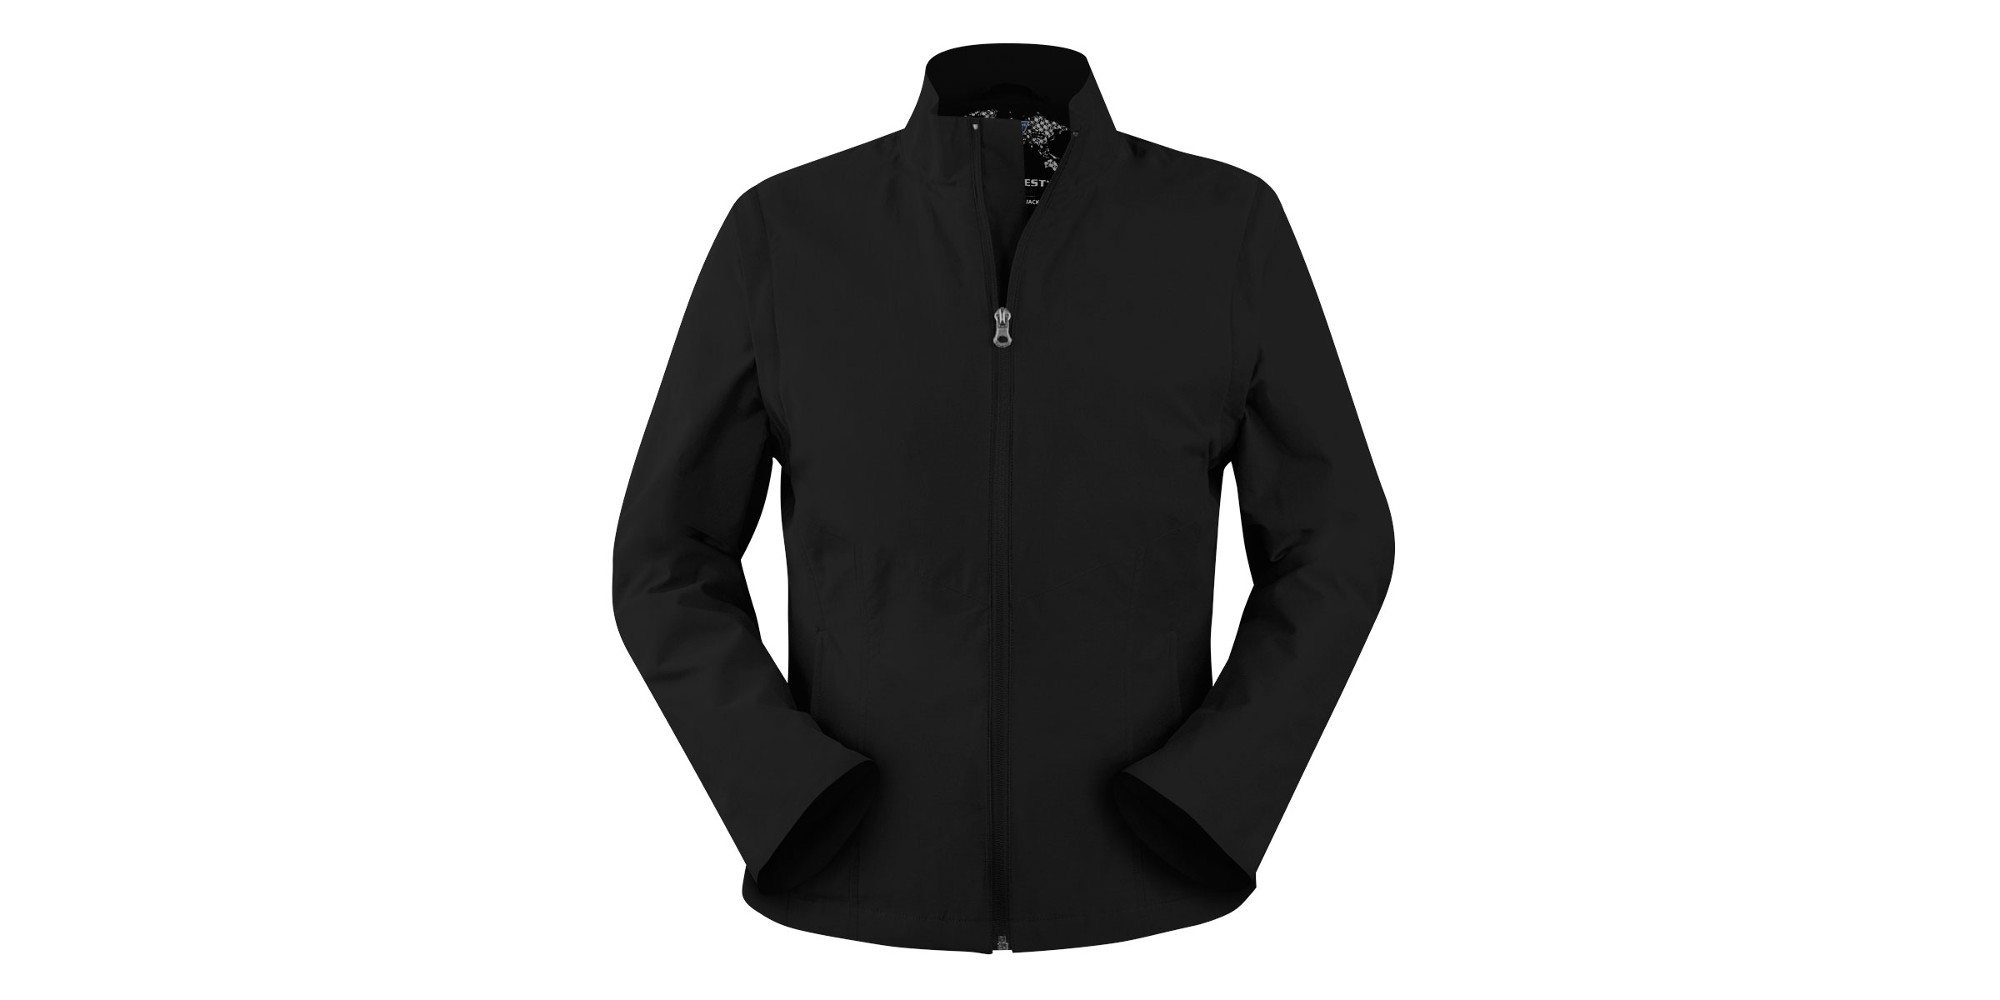 Scottevest's Sterling Jacket for Women (and Men)